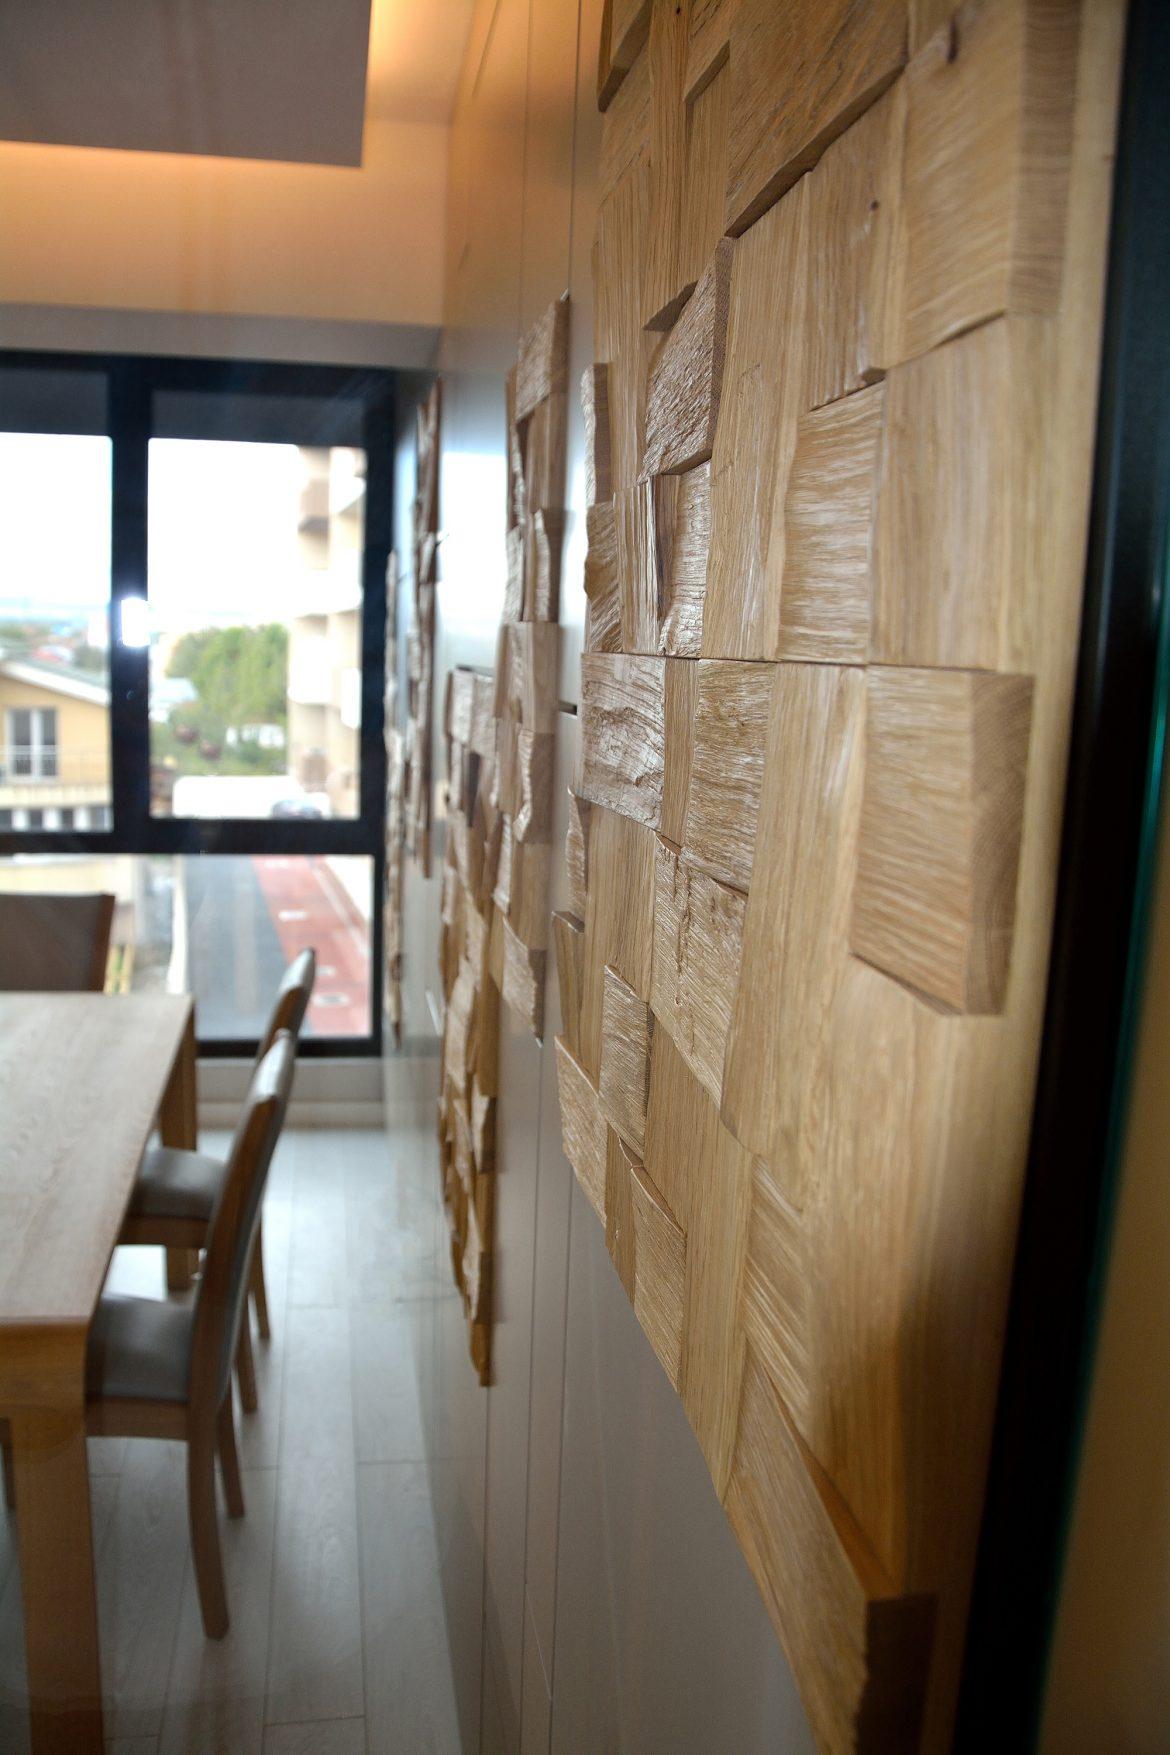 Detaliu placare perete cu Mdf Vopsit Mat Gri cu placi de lemn din stejar masiv